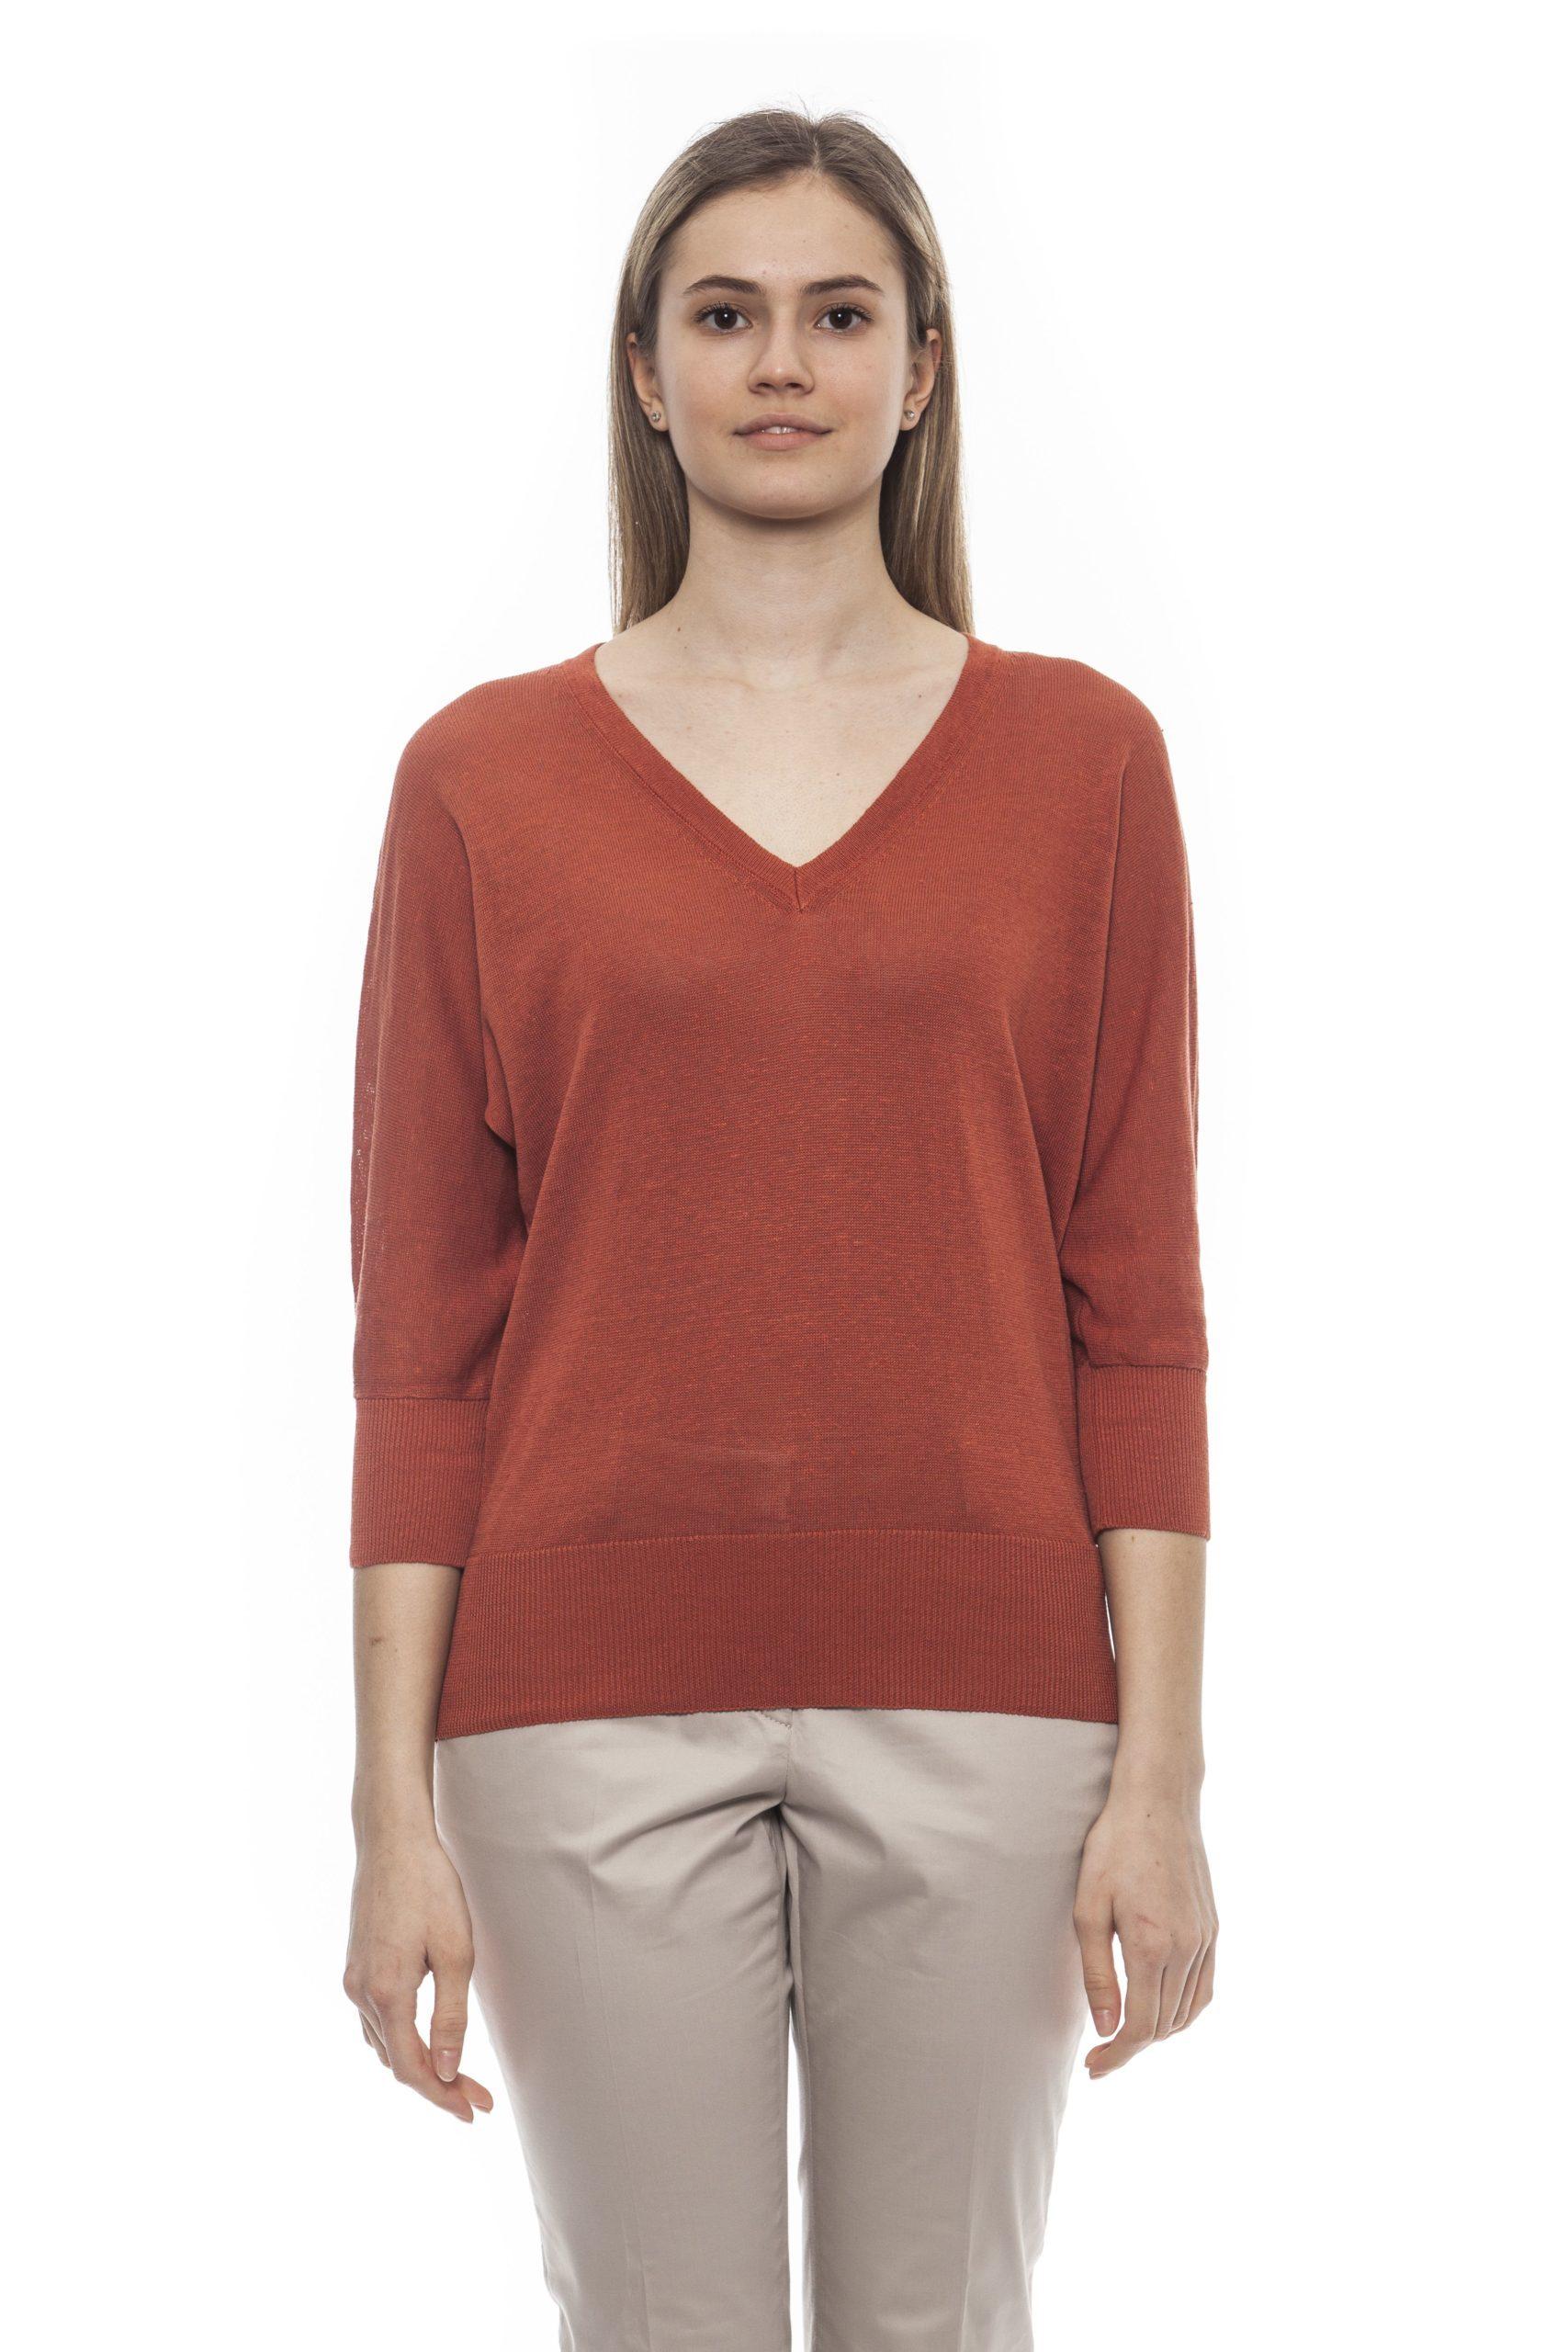 Peserico Women's Marrone Sweater Brown PE1383098 - IT42   S